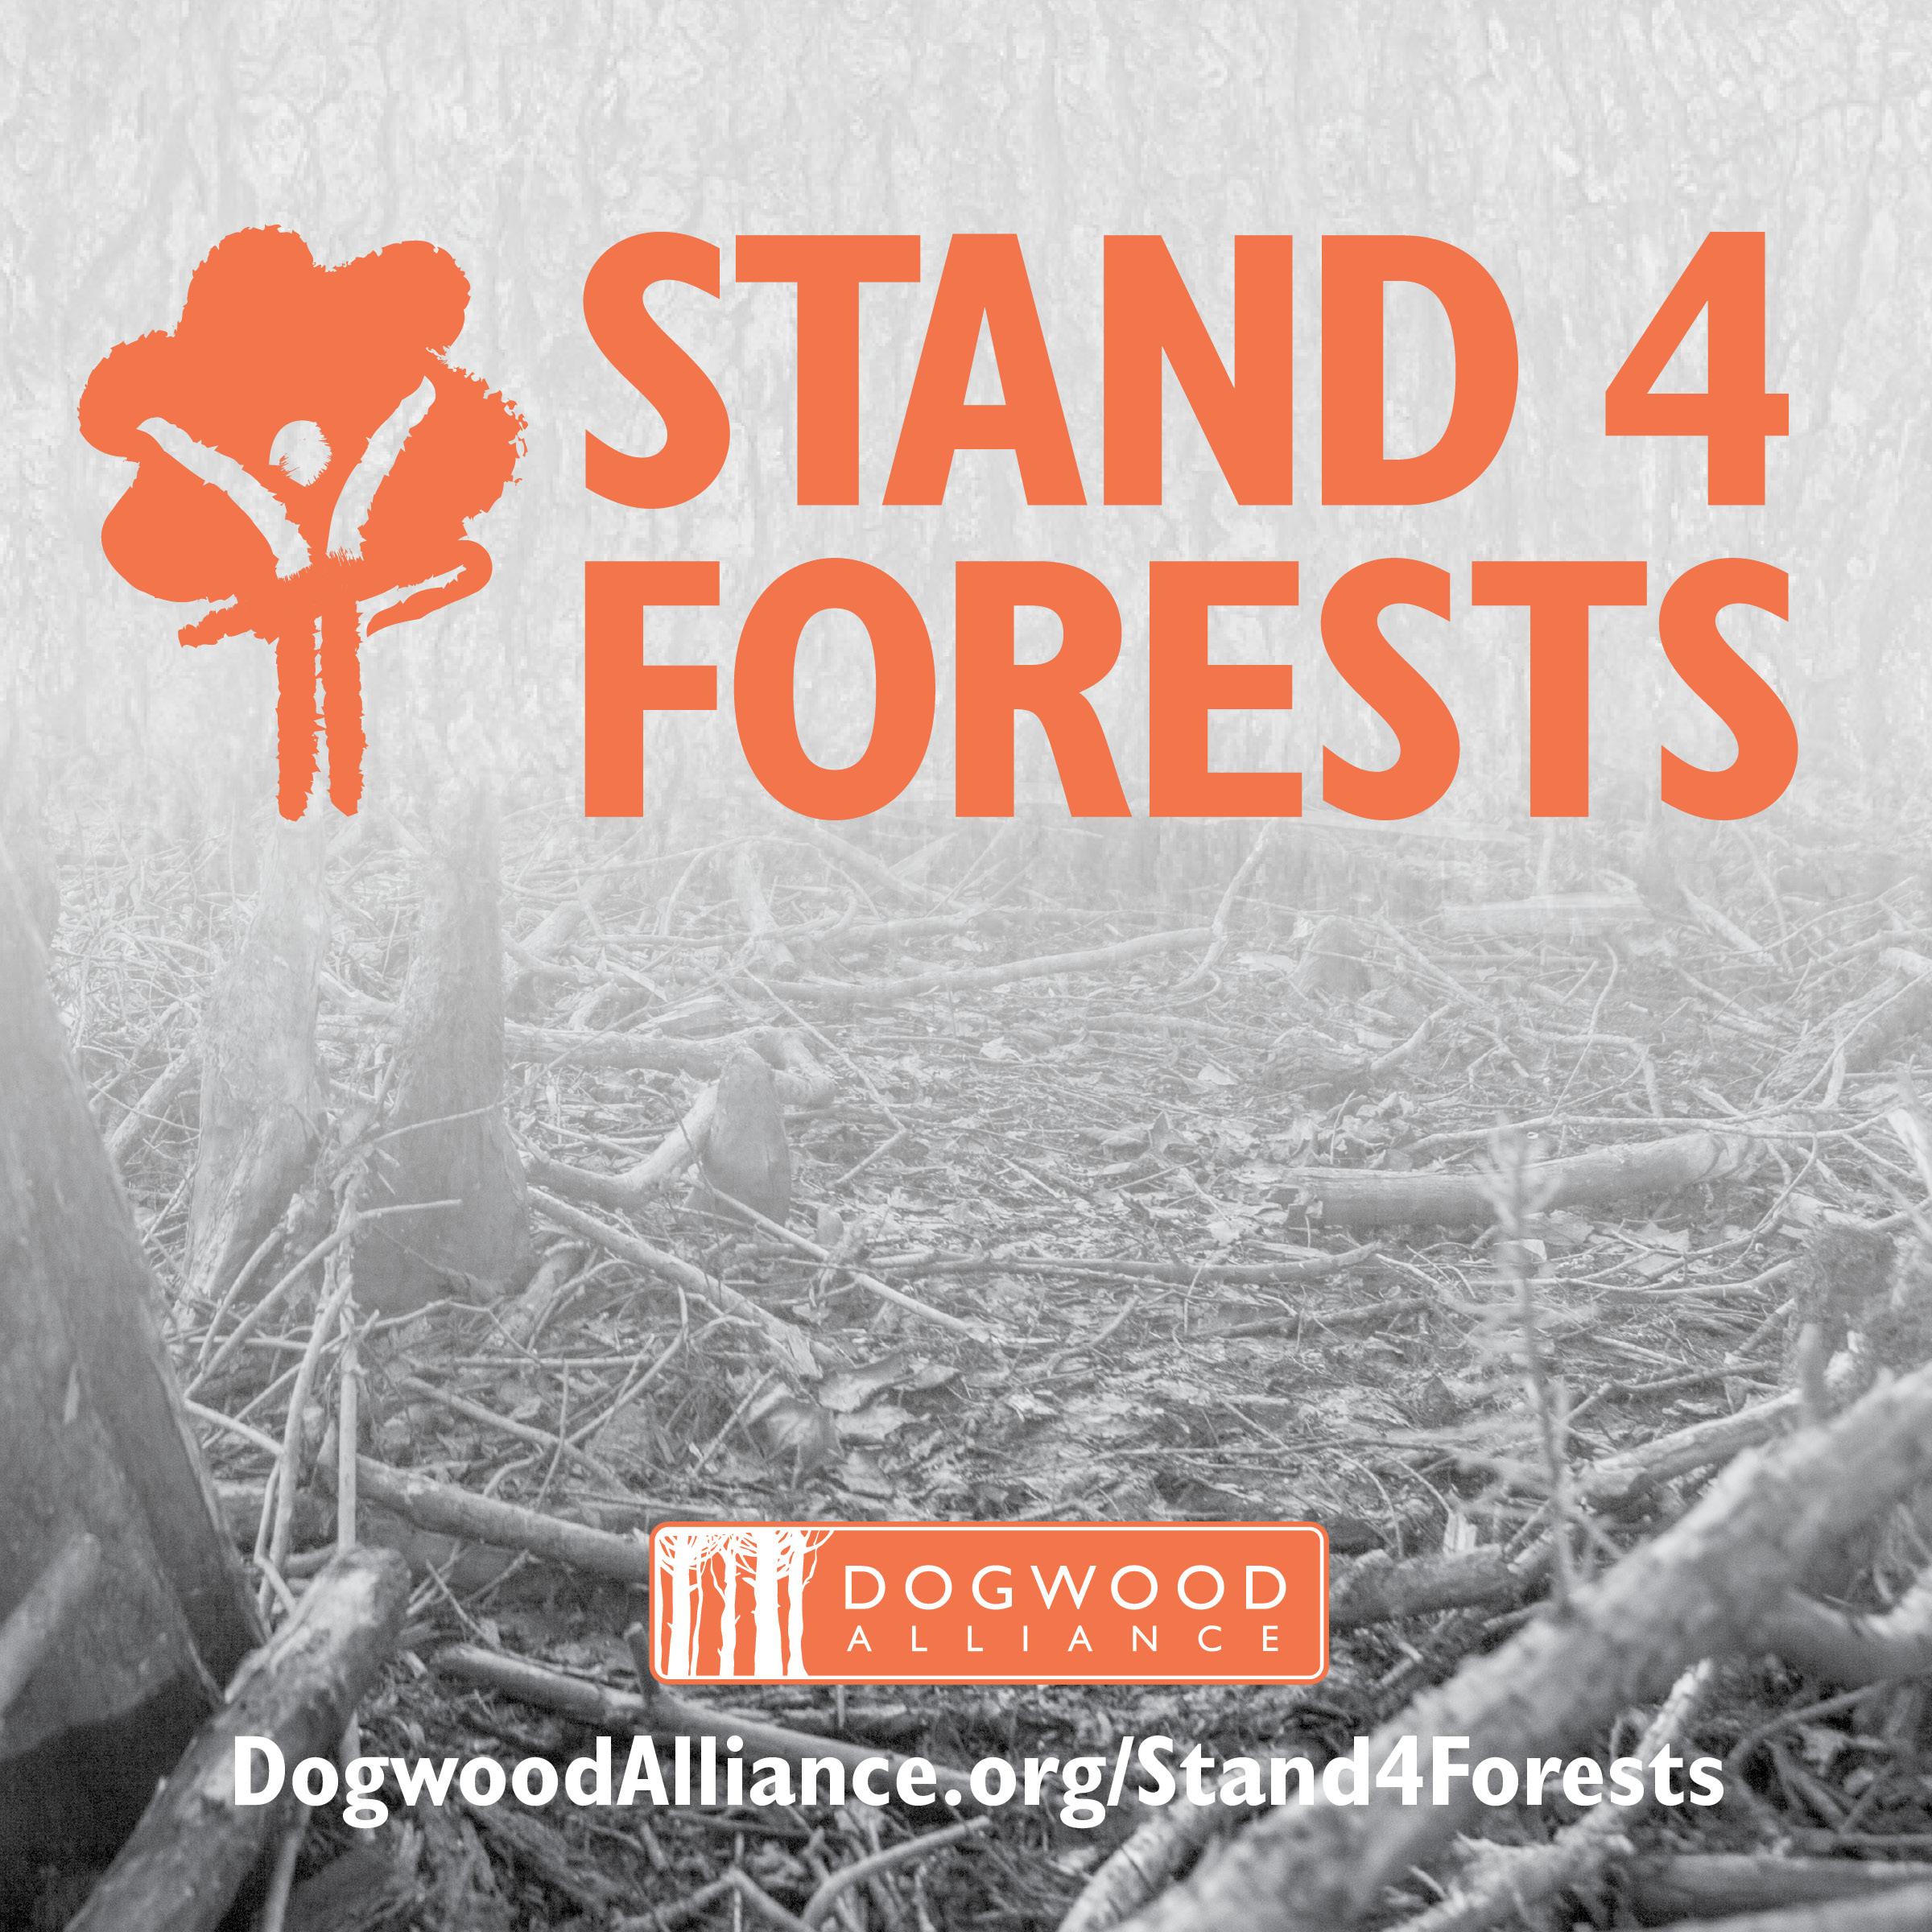 17-DWA-002_Stand4Forests_SocialMedia_v16.jpg